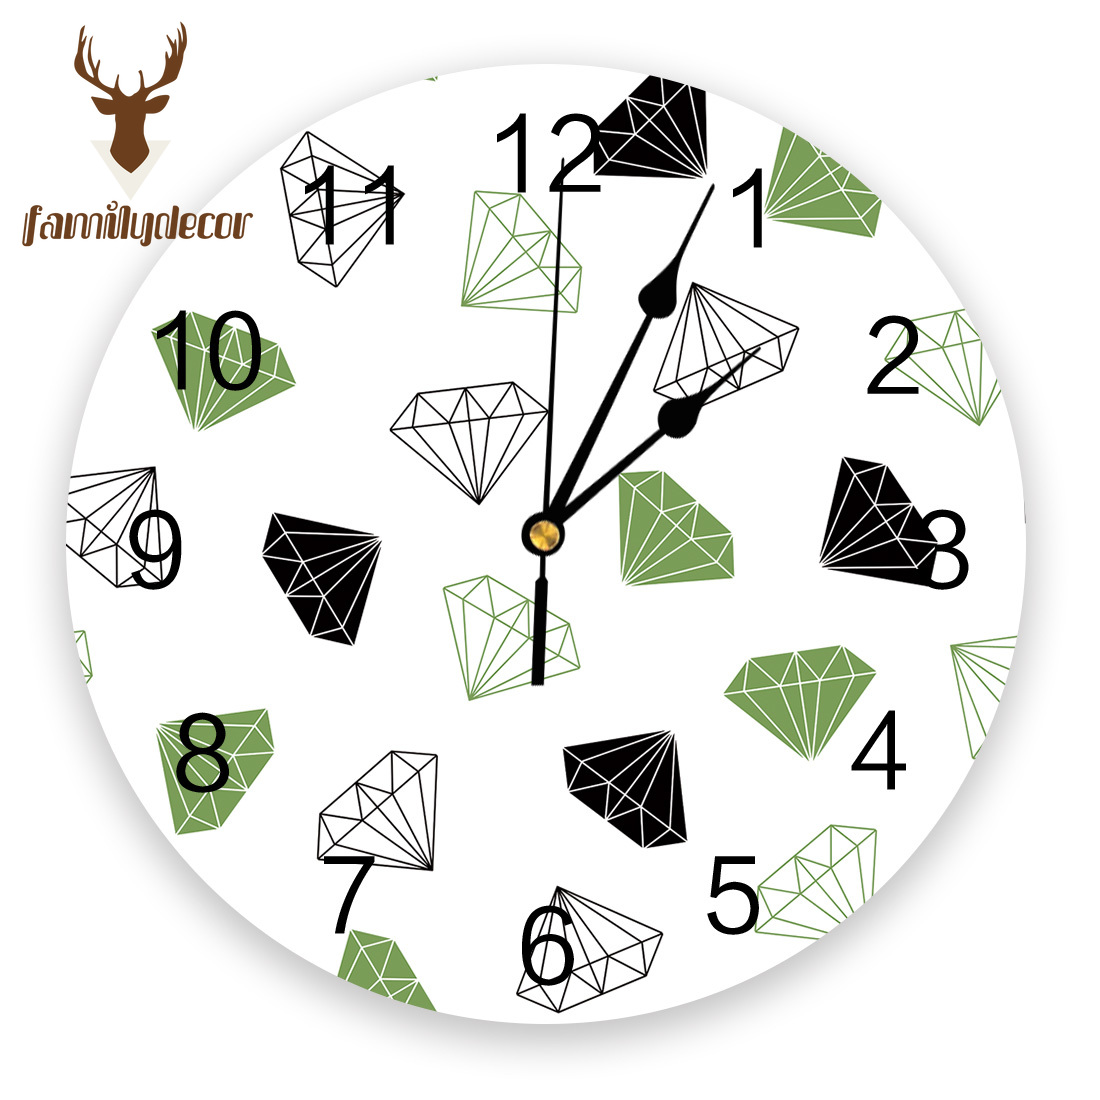 Abstract Geometric Diamond Printed PVC Wall Clock Modern Design Home Decor Bedroom Silent Oclock Watch Wall For Living Room